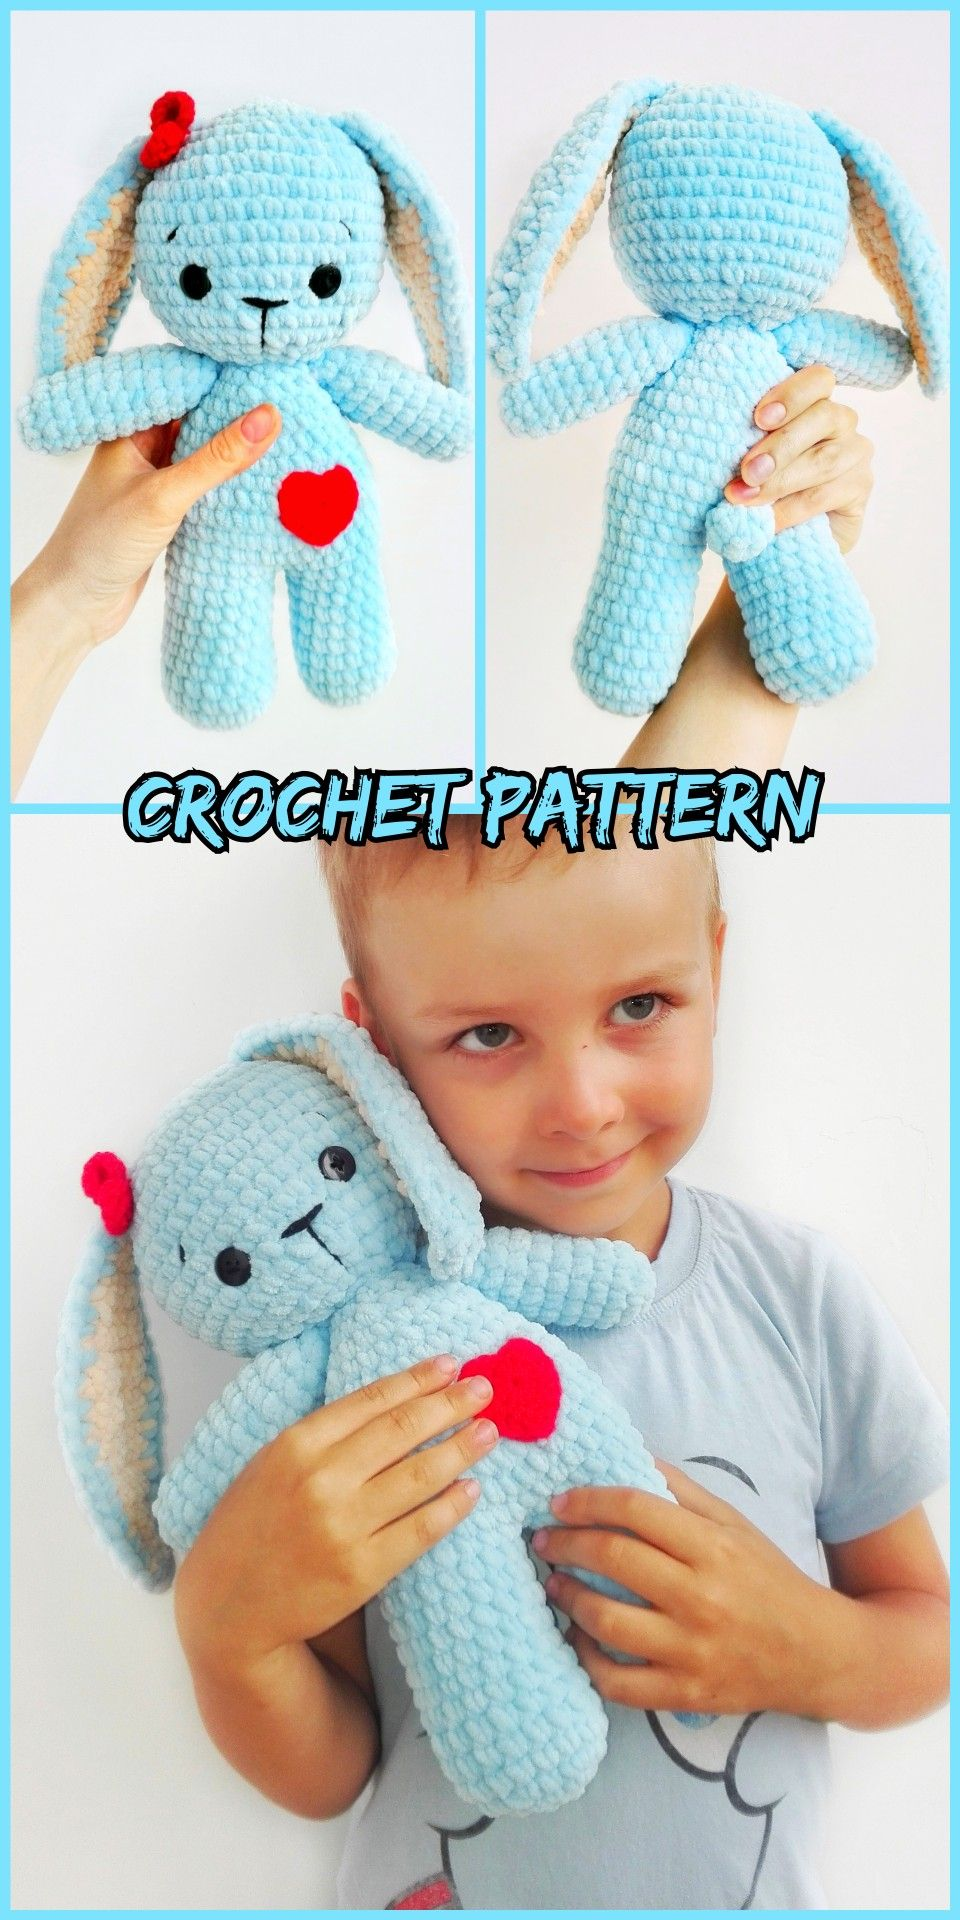 Plush Blue bunny pattern by Julia Kor | Crochet toys, Crochet ... | 1920x960